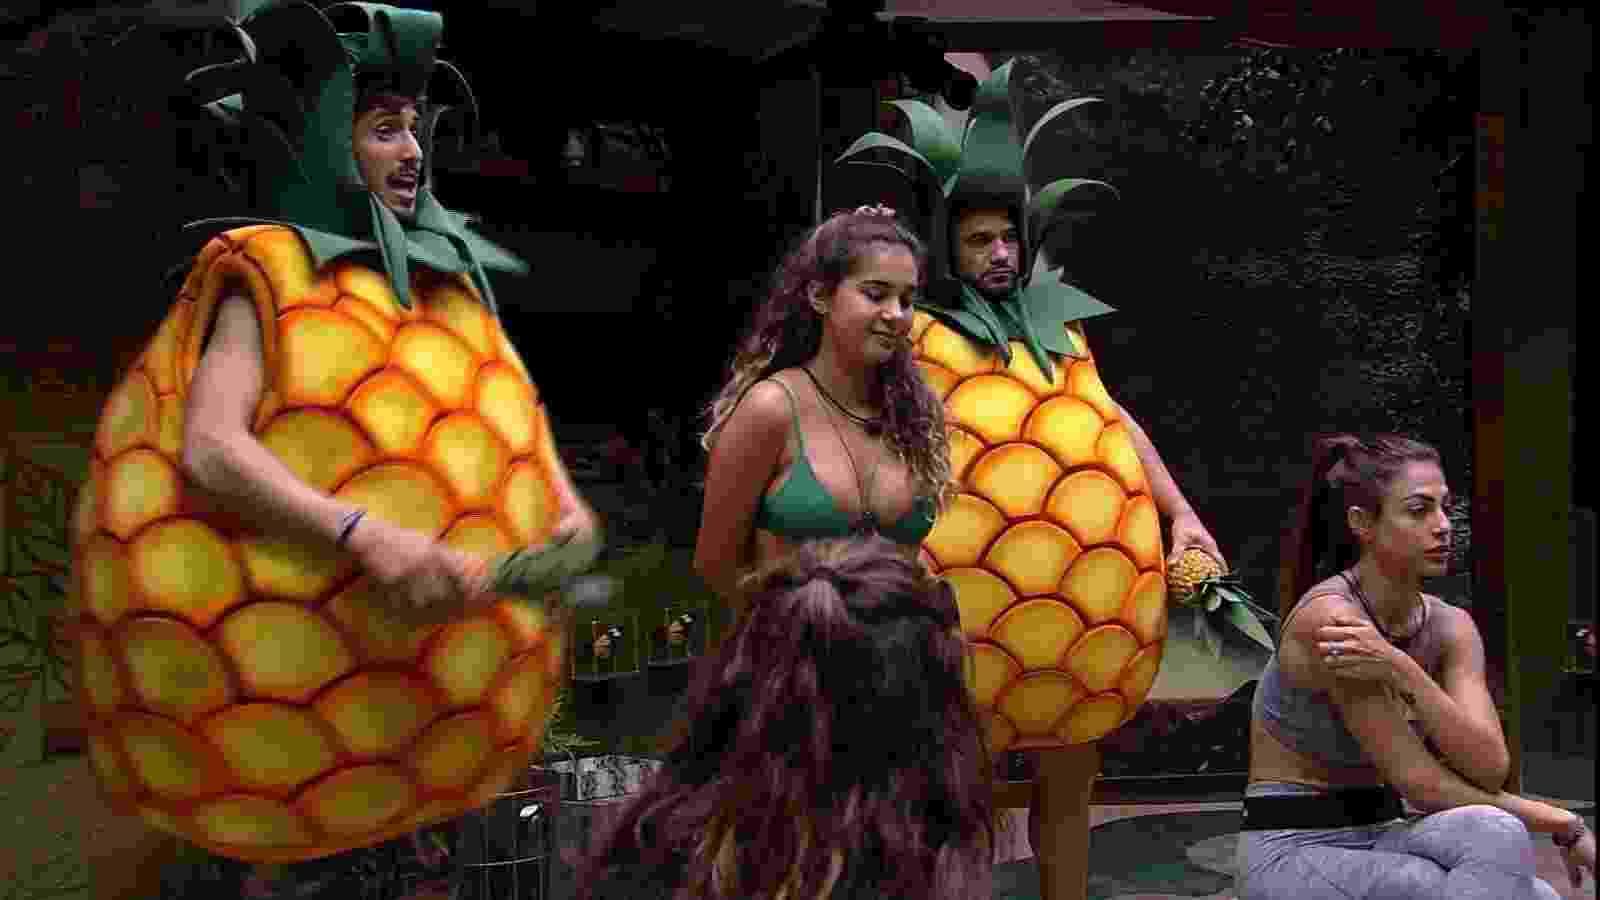 bbb 20: Hadson de abacaxi - Reprodução/Globoplay